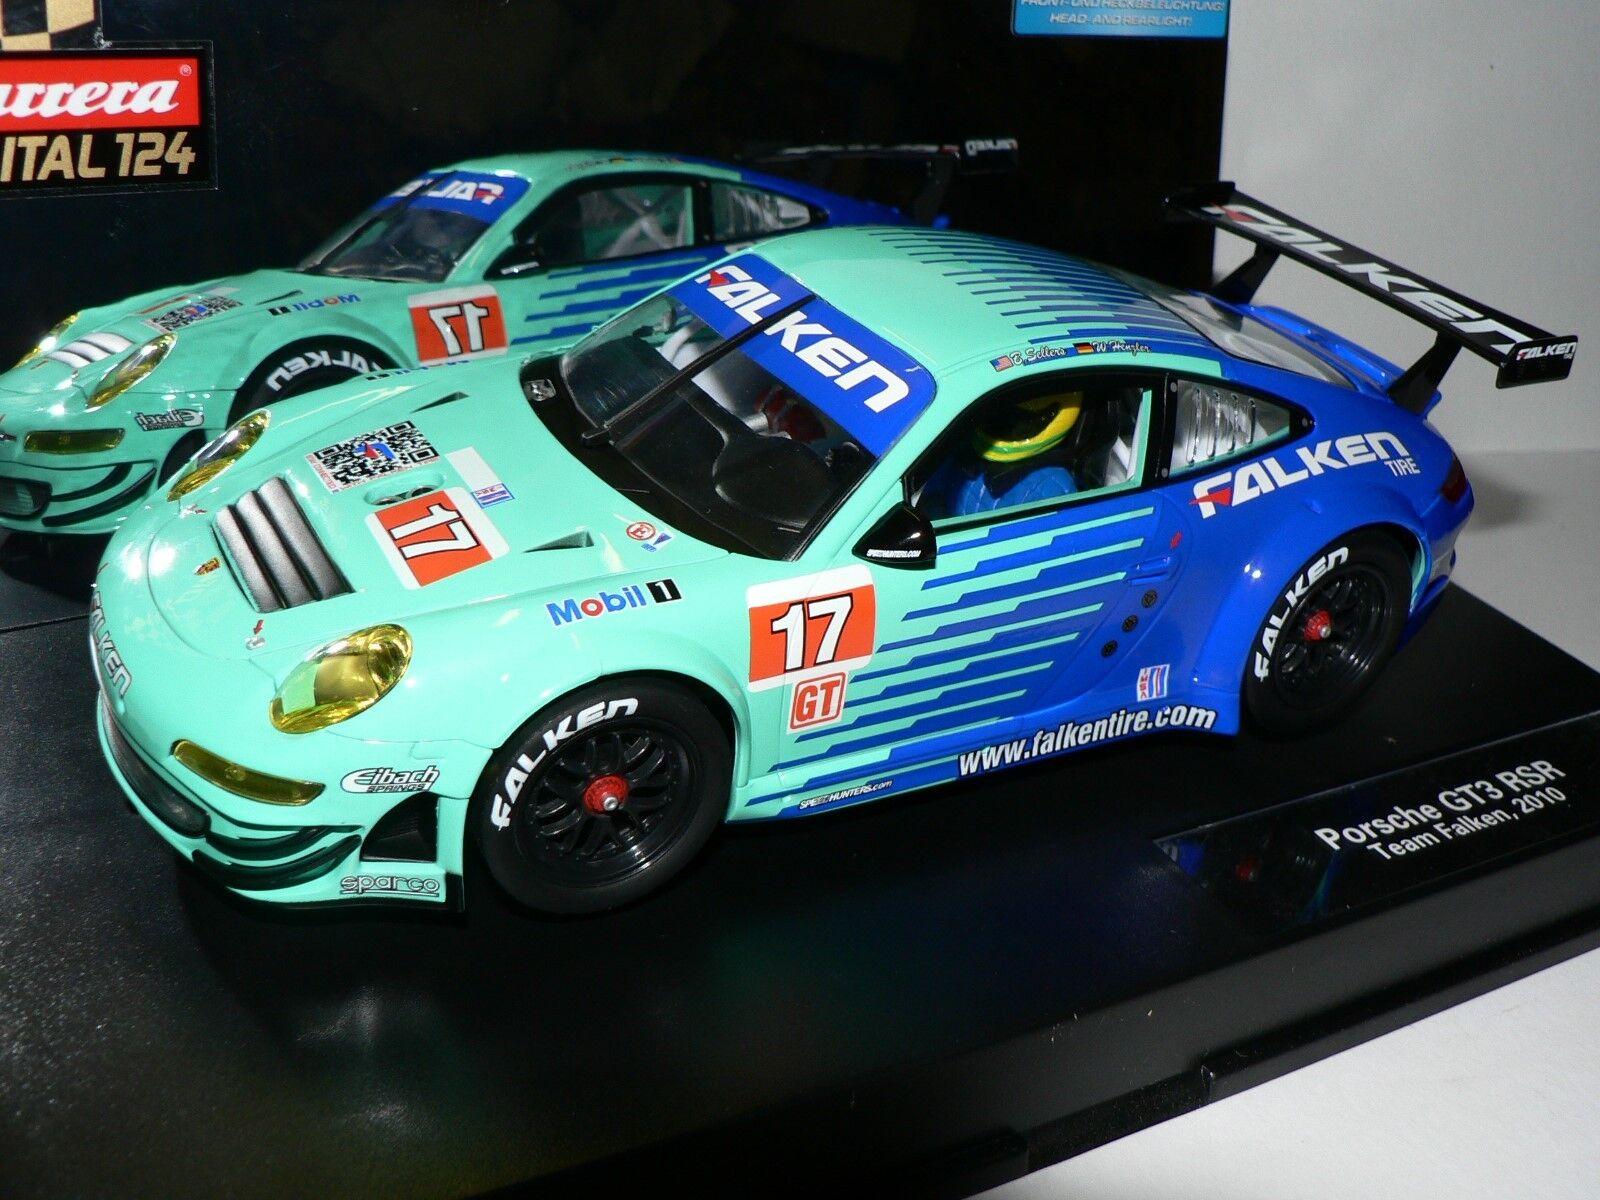 Carrera Digital124 Porsche GT3 RSR TEAM FALCO 2010 23759 NUOVO